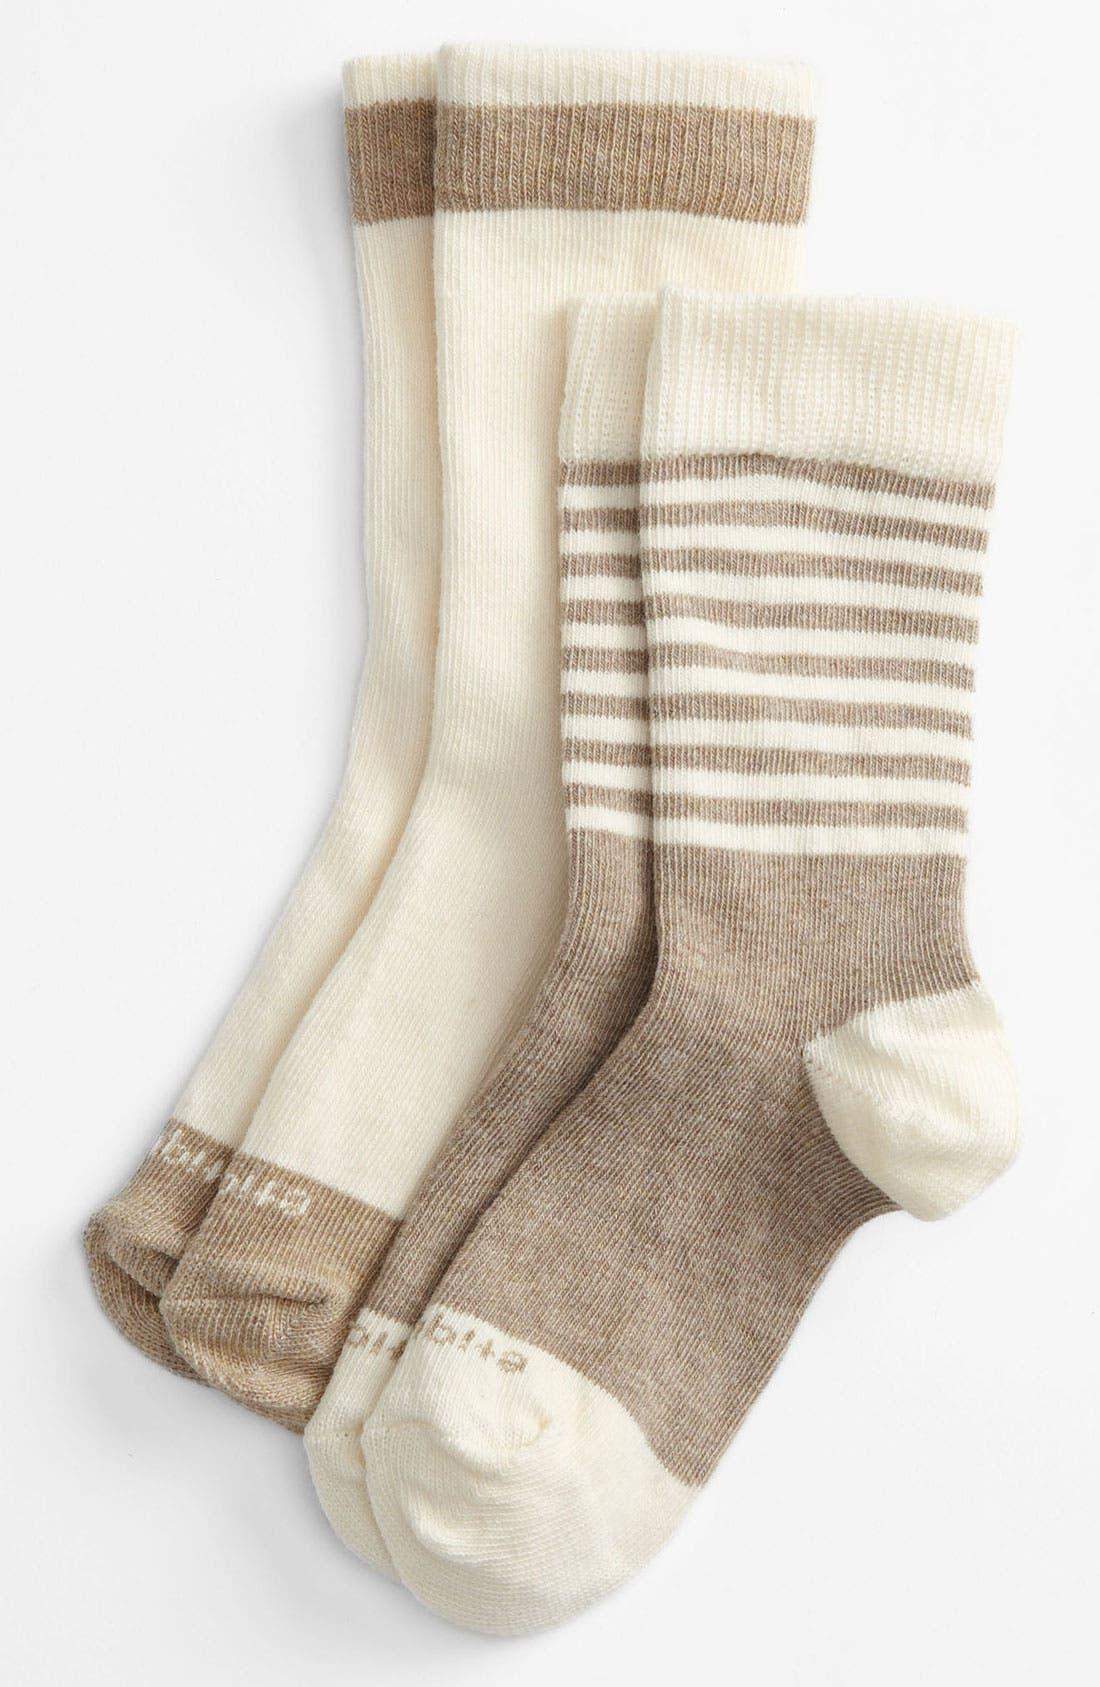 Alternate Image 1 Selected - Etiquette Clothiers 'Preppy Stripe' Socks (2-Pack) (Toddler, Little Kid & Big Kid)